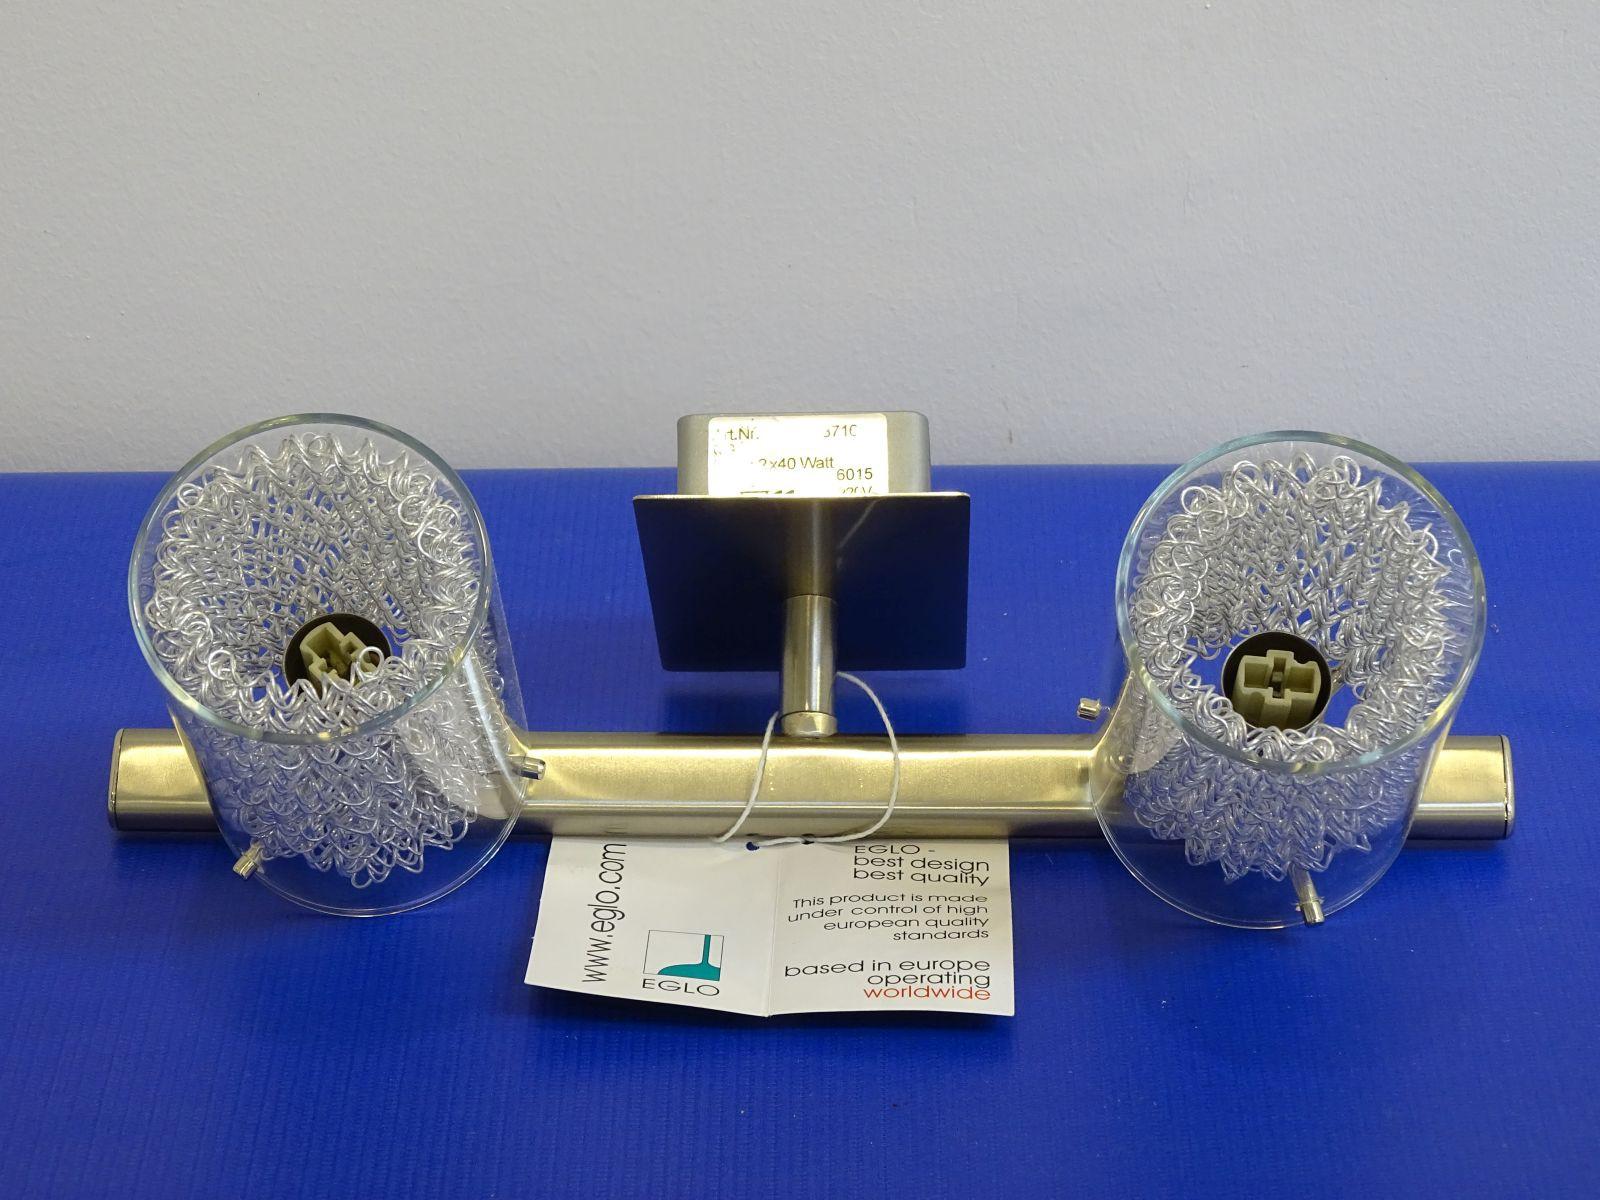 DSC06900.JPG (1600�1200)